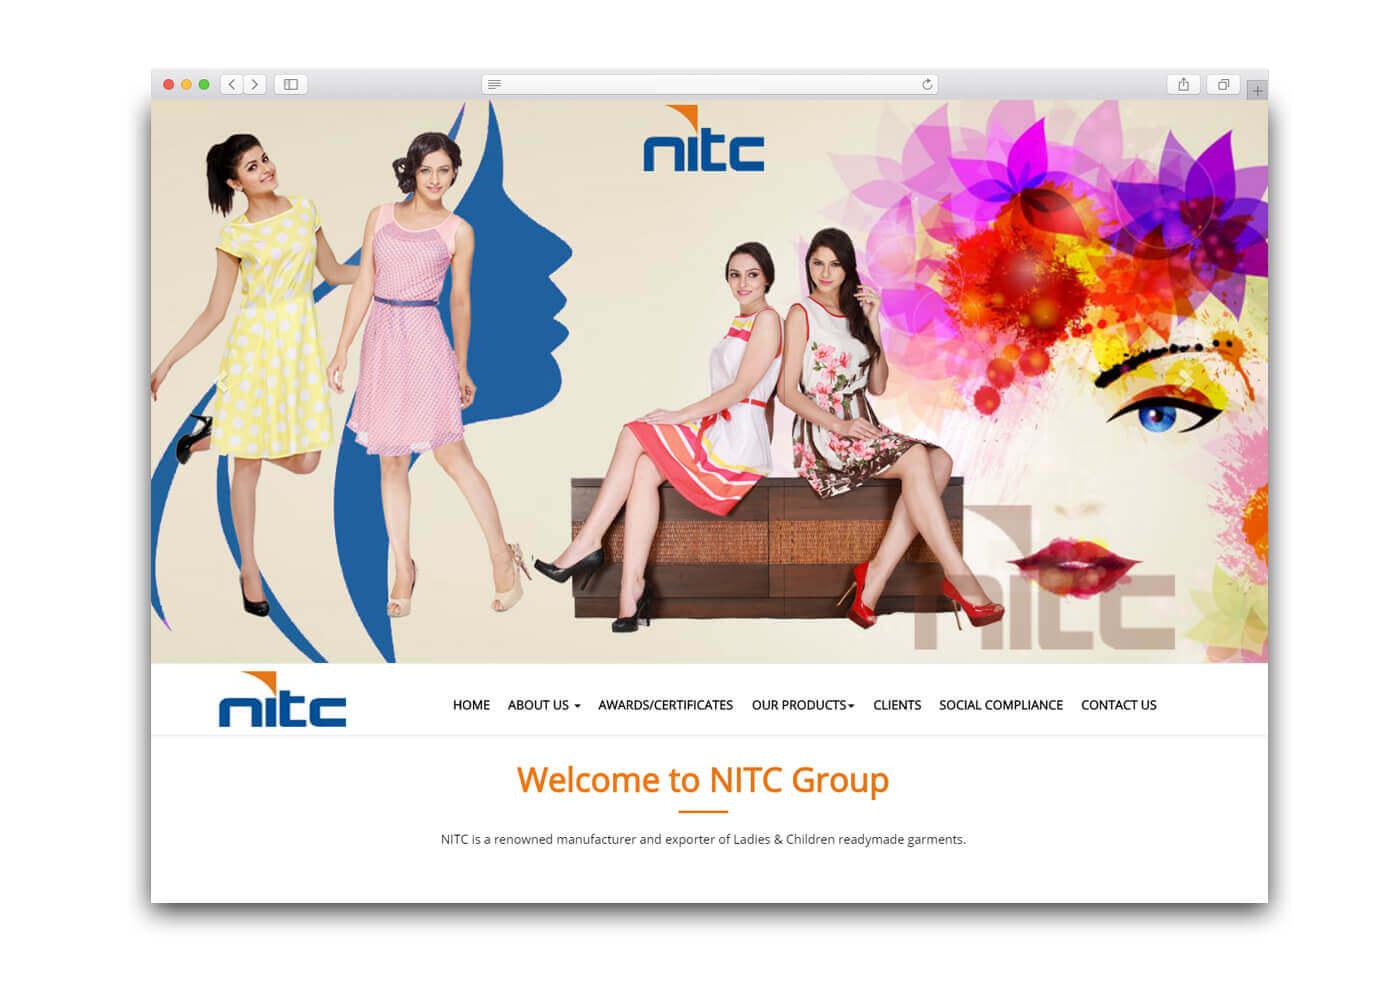 NITC Group